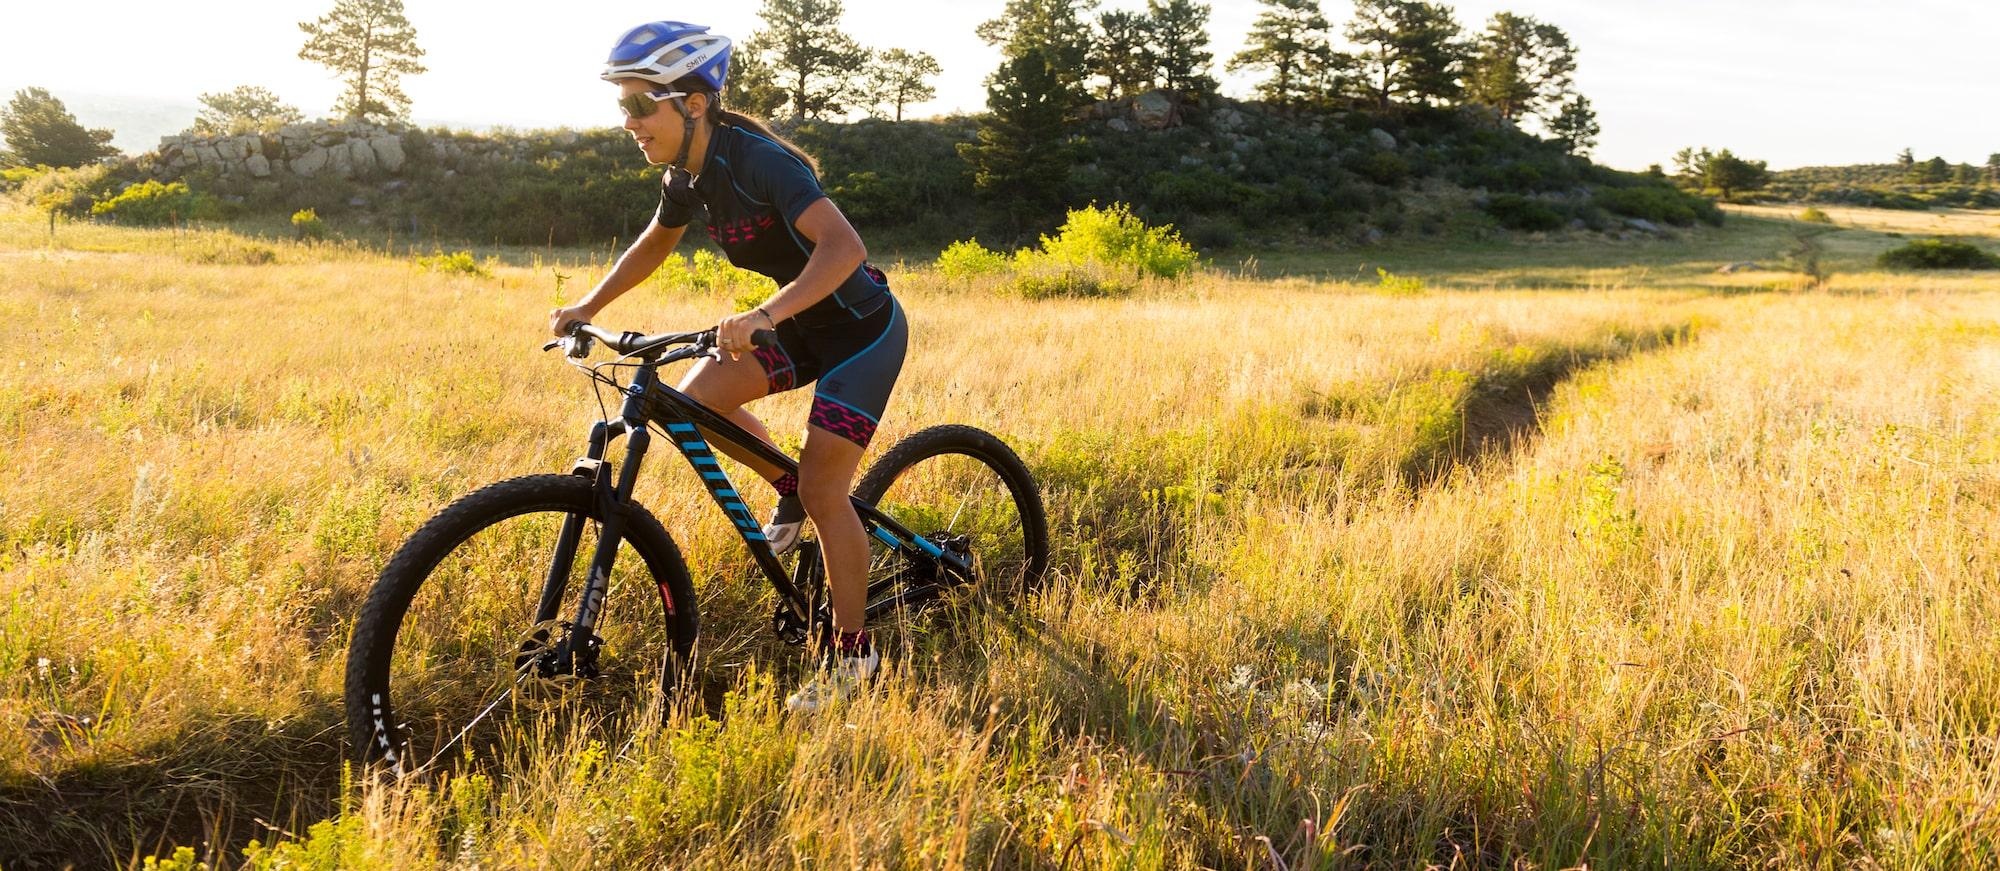 Professional mountain biker riding on a bike trail.